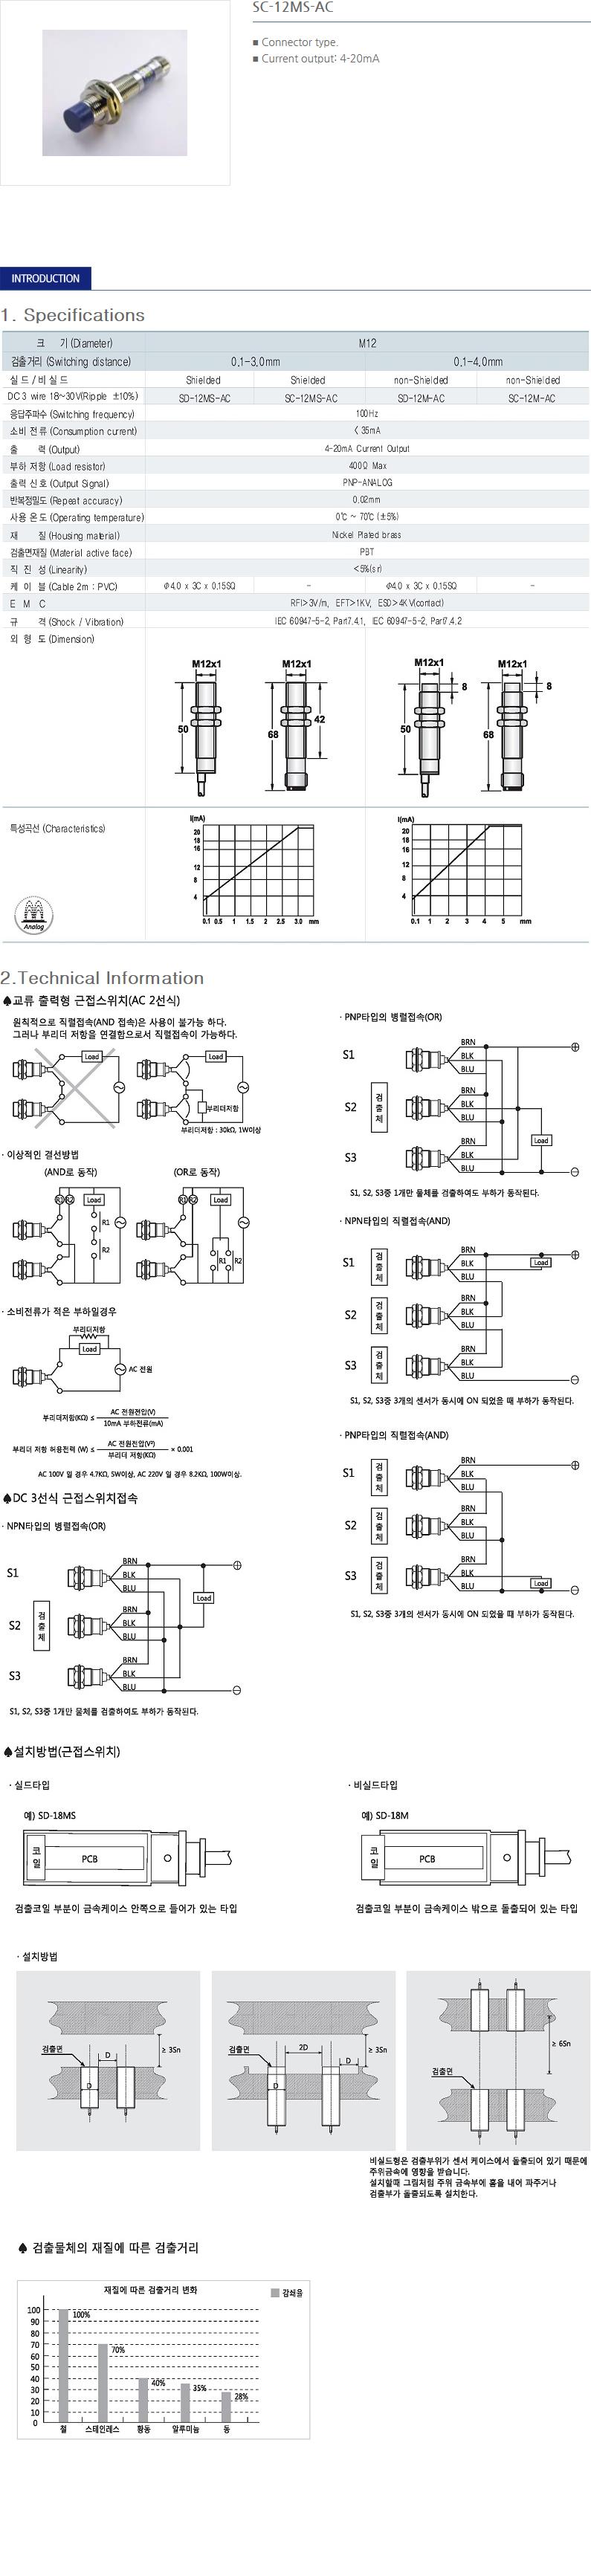 SANIL DC Analog Type Proximity Sensor  8